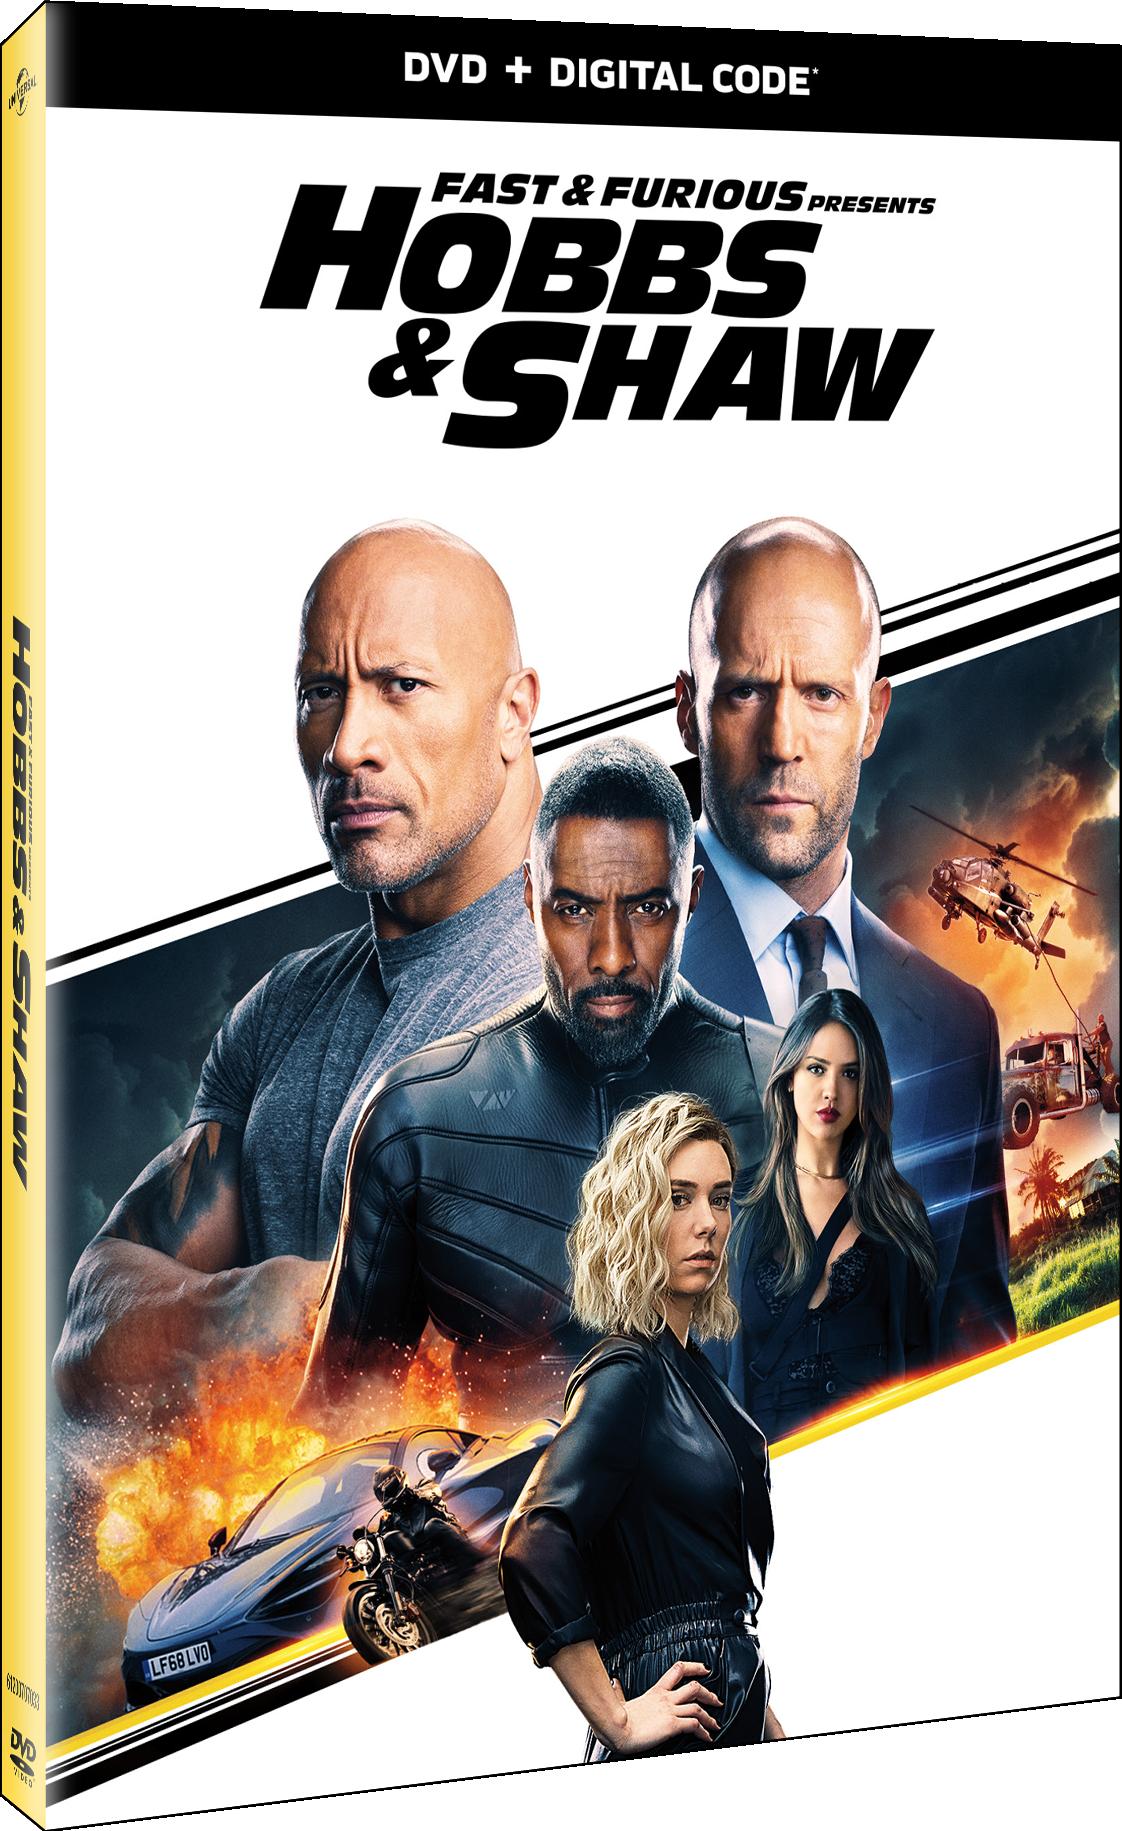 Buy Hobbs & Shaw on DVD.